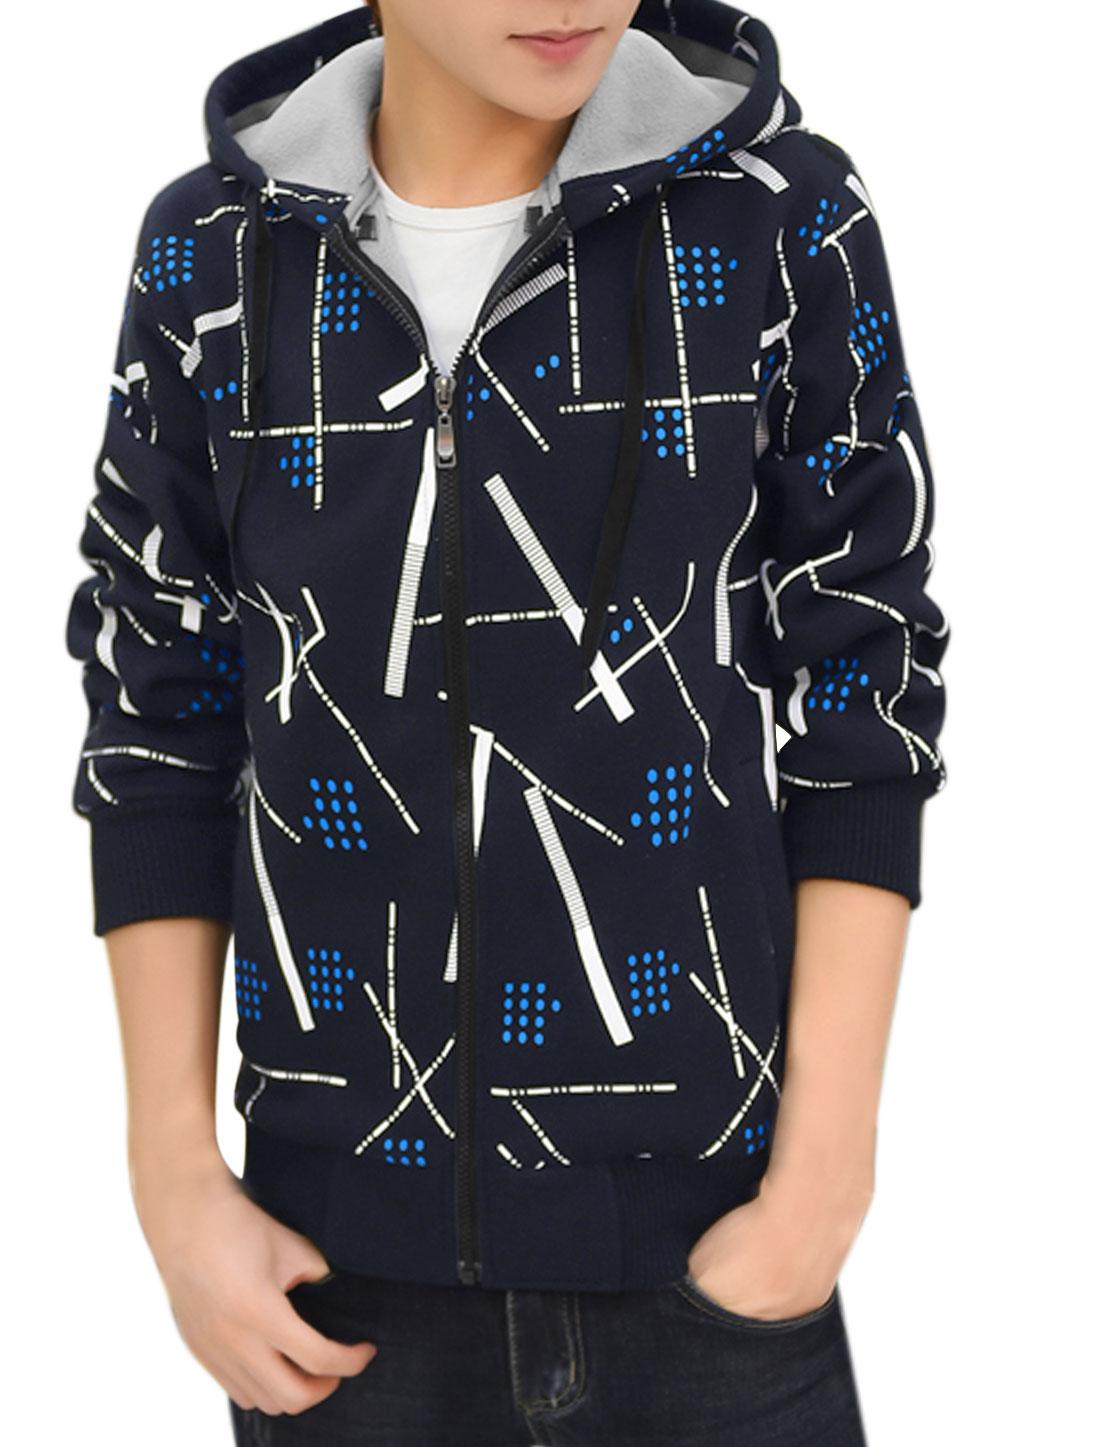 Men Zip Up Slim Fit Hooded Fleece Geometric Jacket Navy Blue M